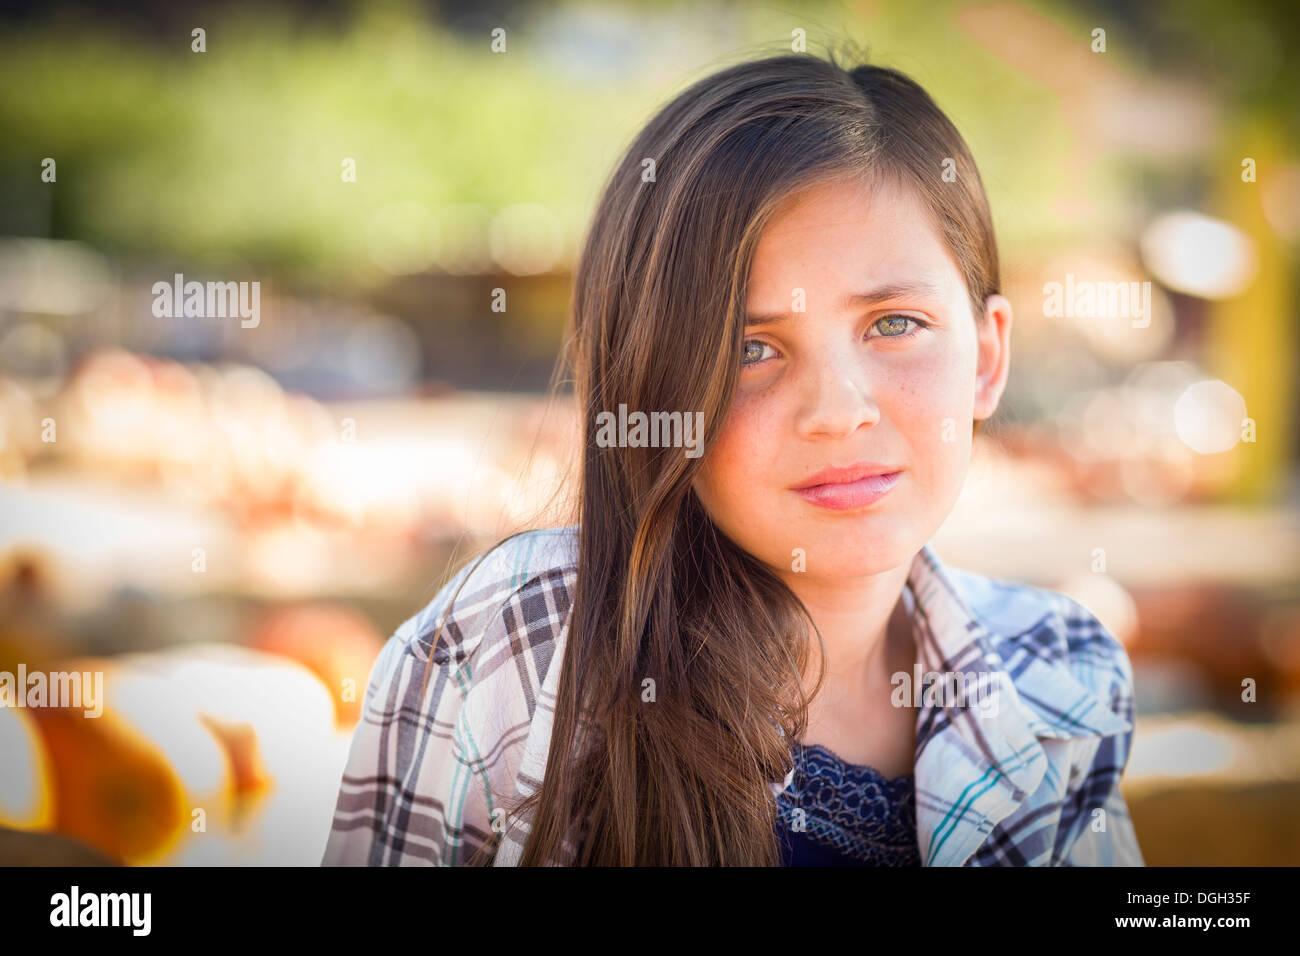 Preteen Mädchen Portrait im Kürbisbeet in rustikaler Umgebung. Stockbild